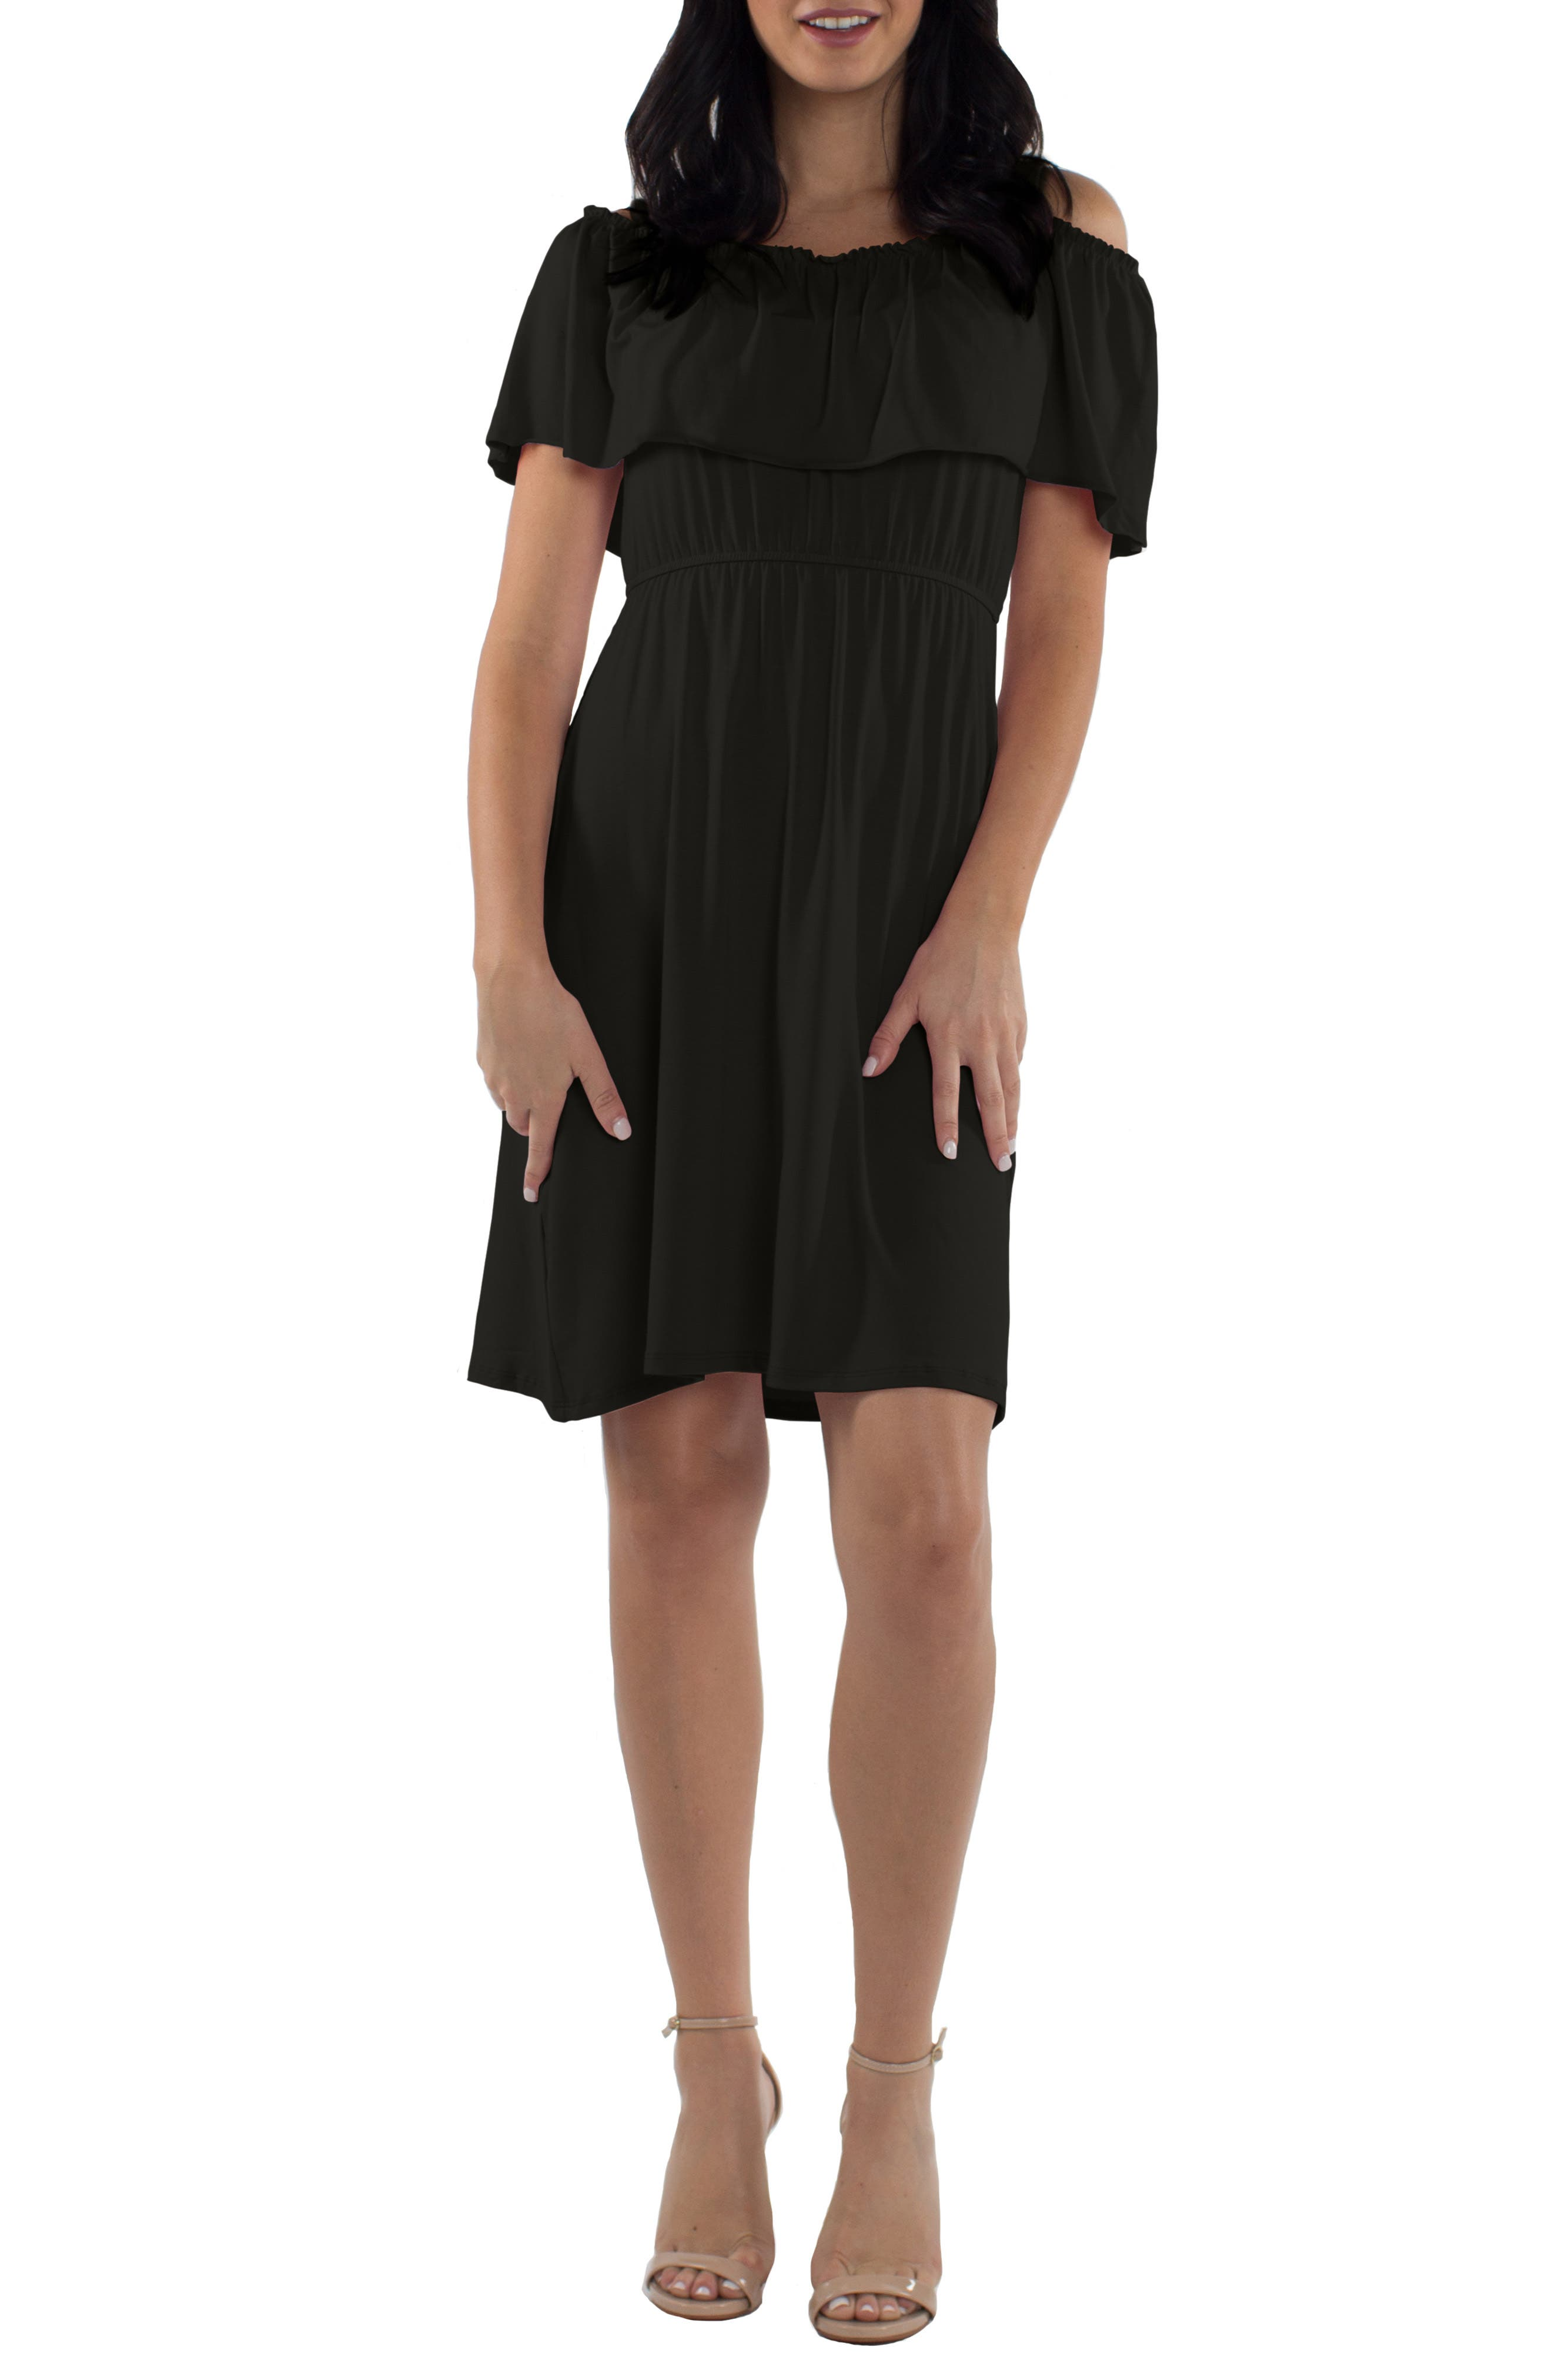 Reagan Nursing Dress,                             Main thumbnail 1, color,                             BLACK